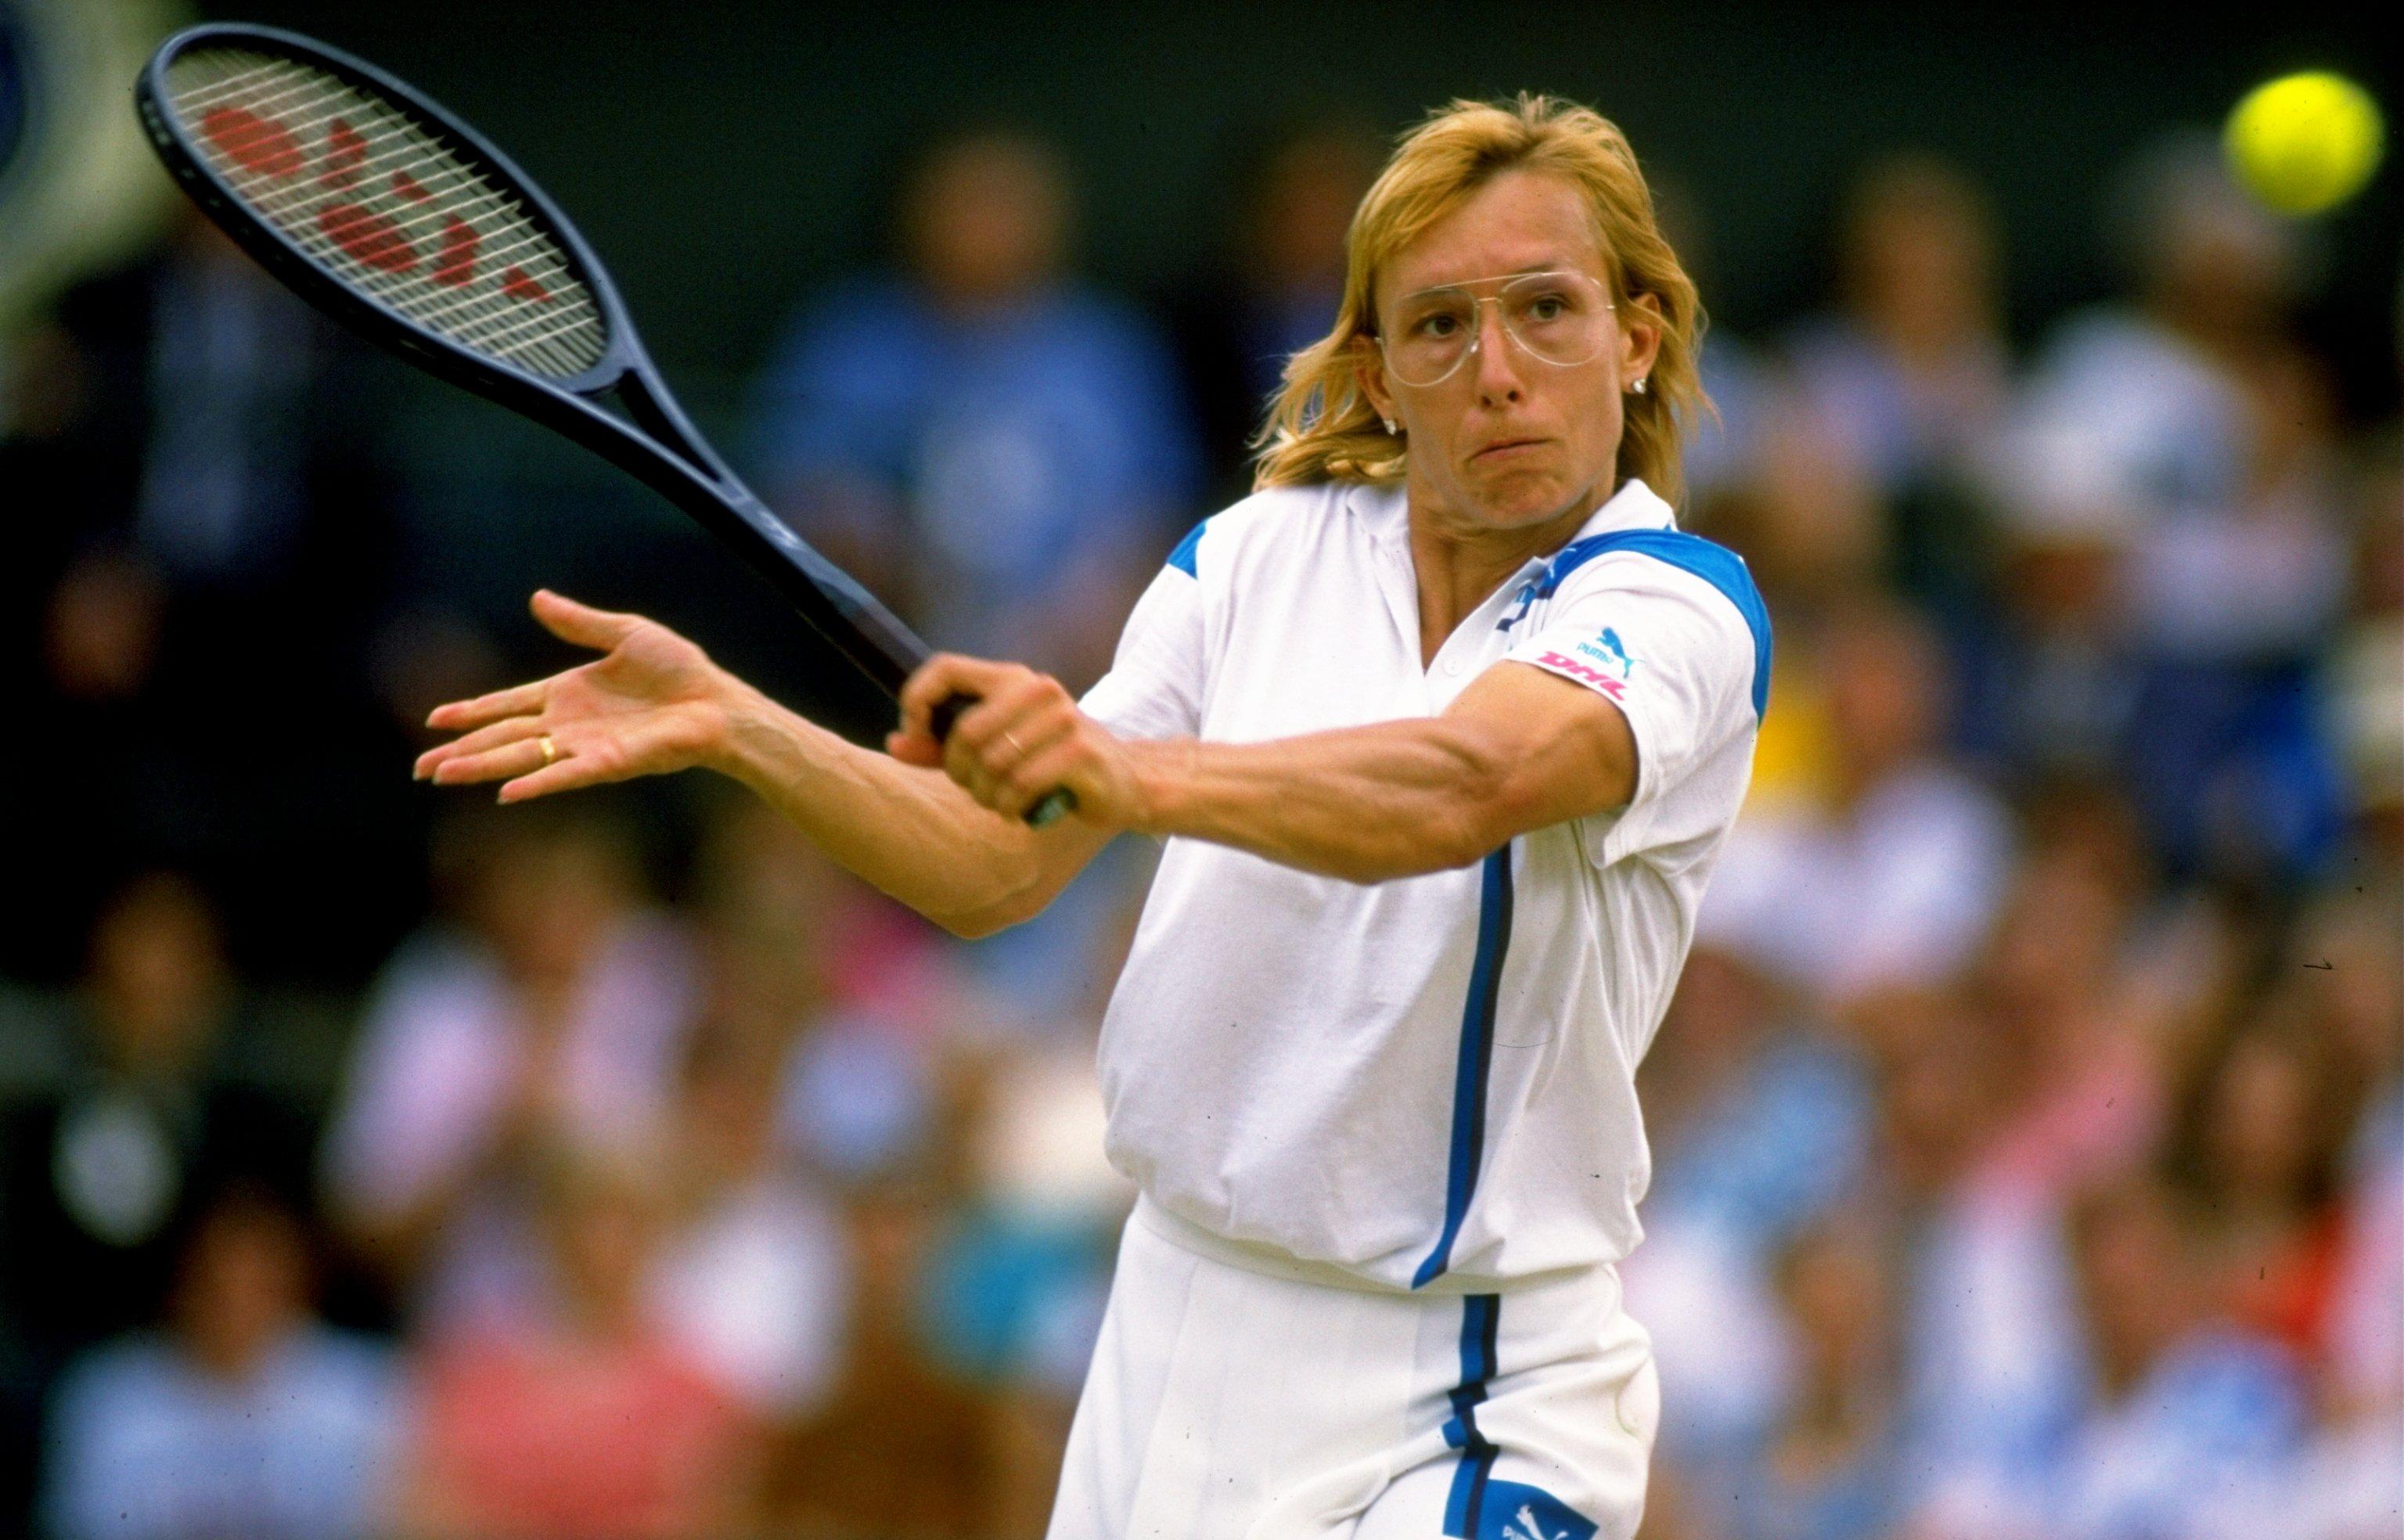 Martina Navratilova 18 Grand Slam singles titles